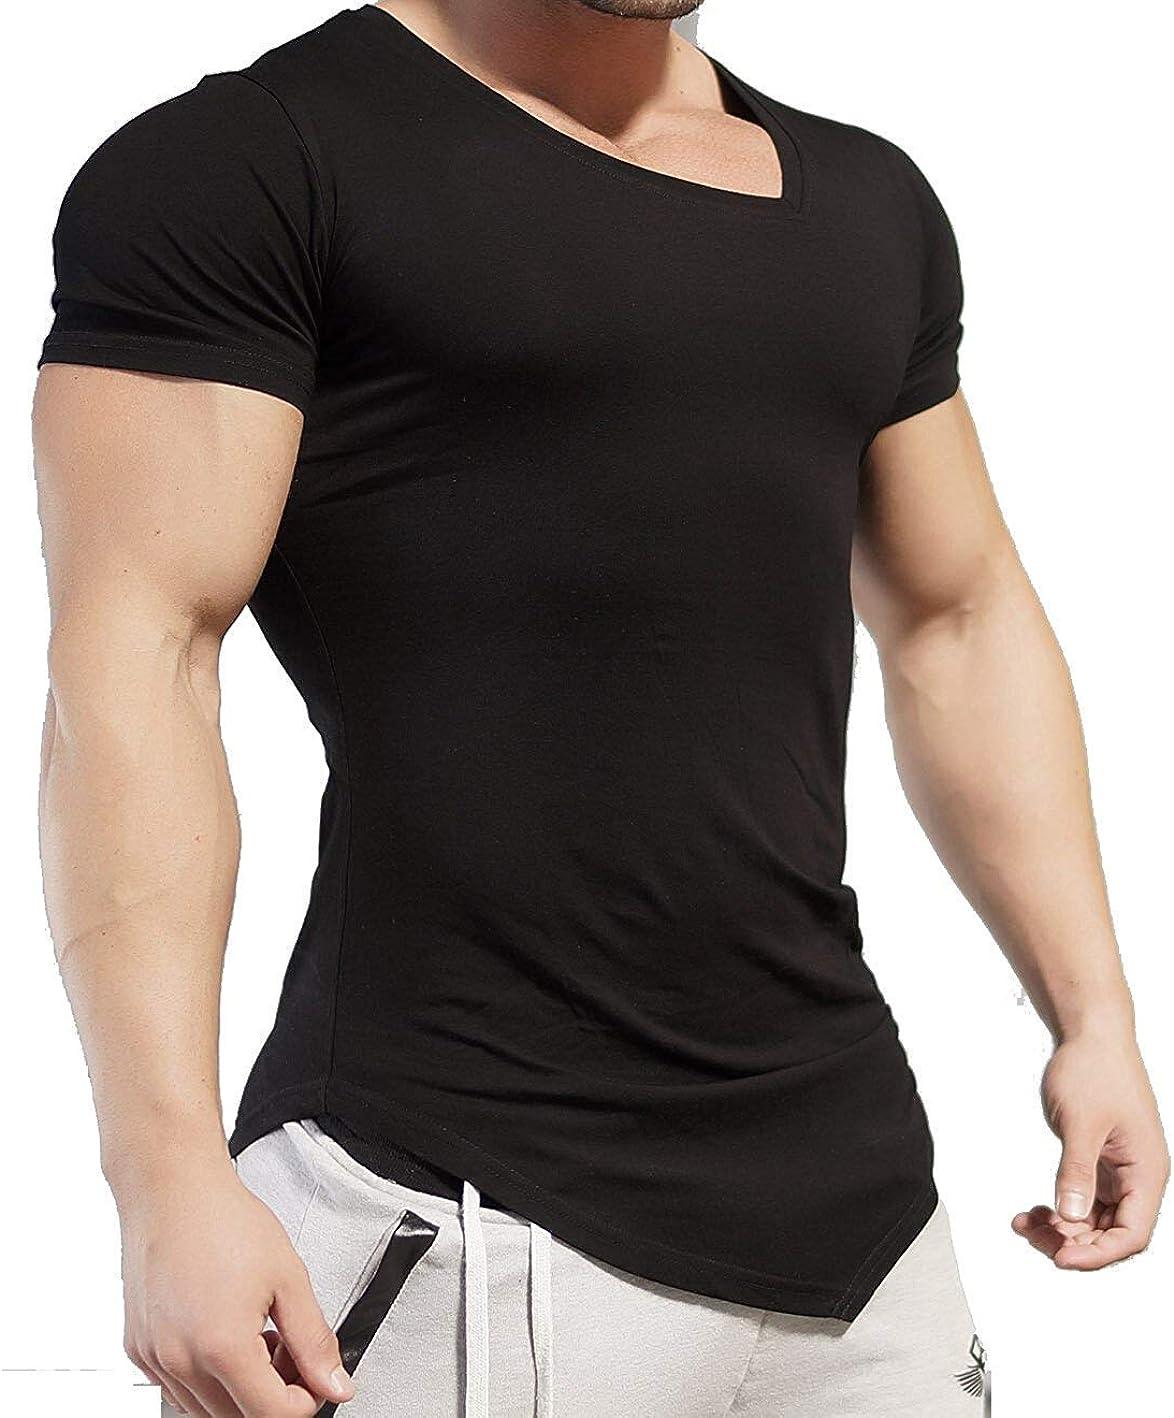 JINIDU Mens Workout Tee Short Sleeve Gym Training Bodybuilding Muscle Fitness T Shirt